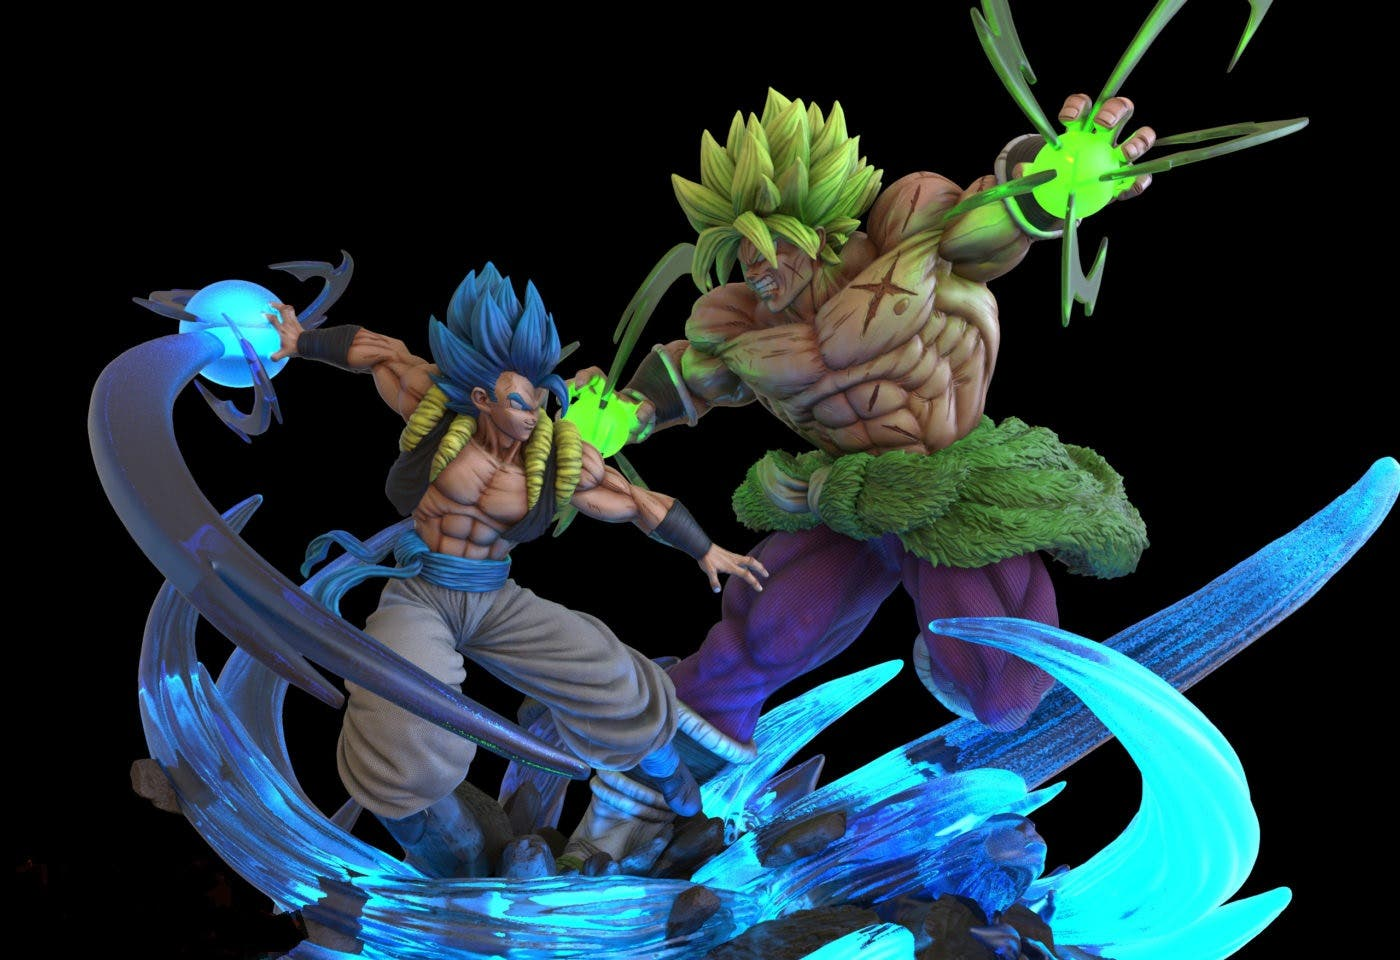 Imagen de Gogeta principal protagonista de la nueva figura de Dragon Ball Super: Broly